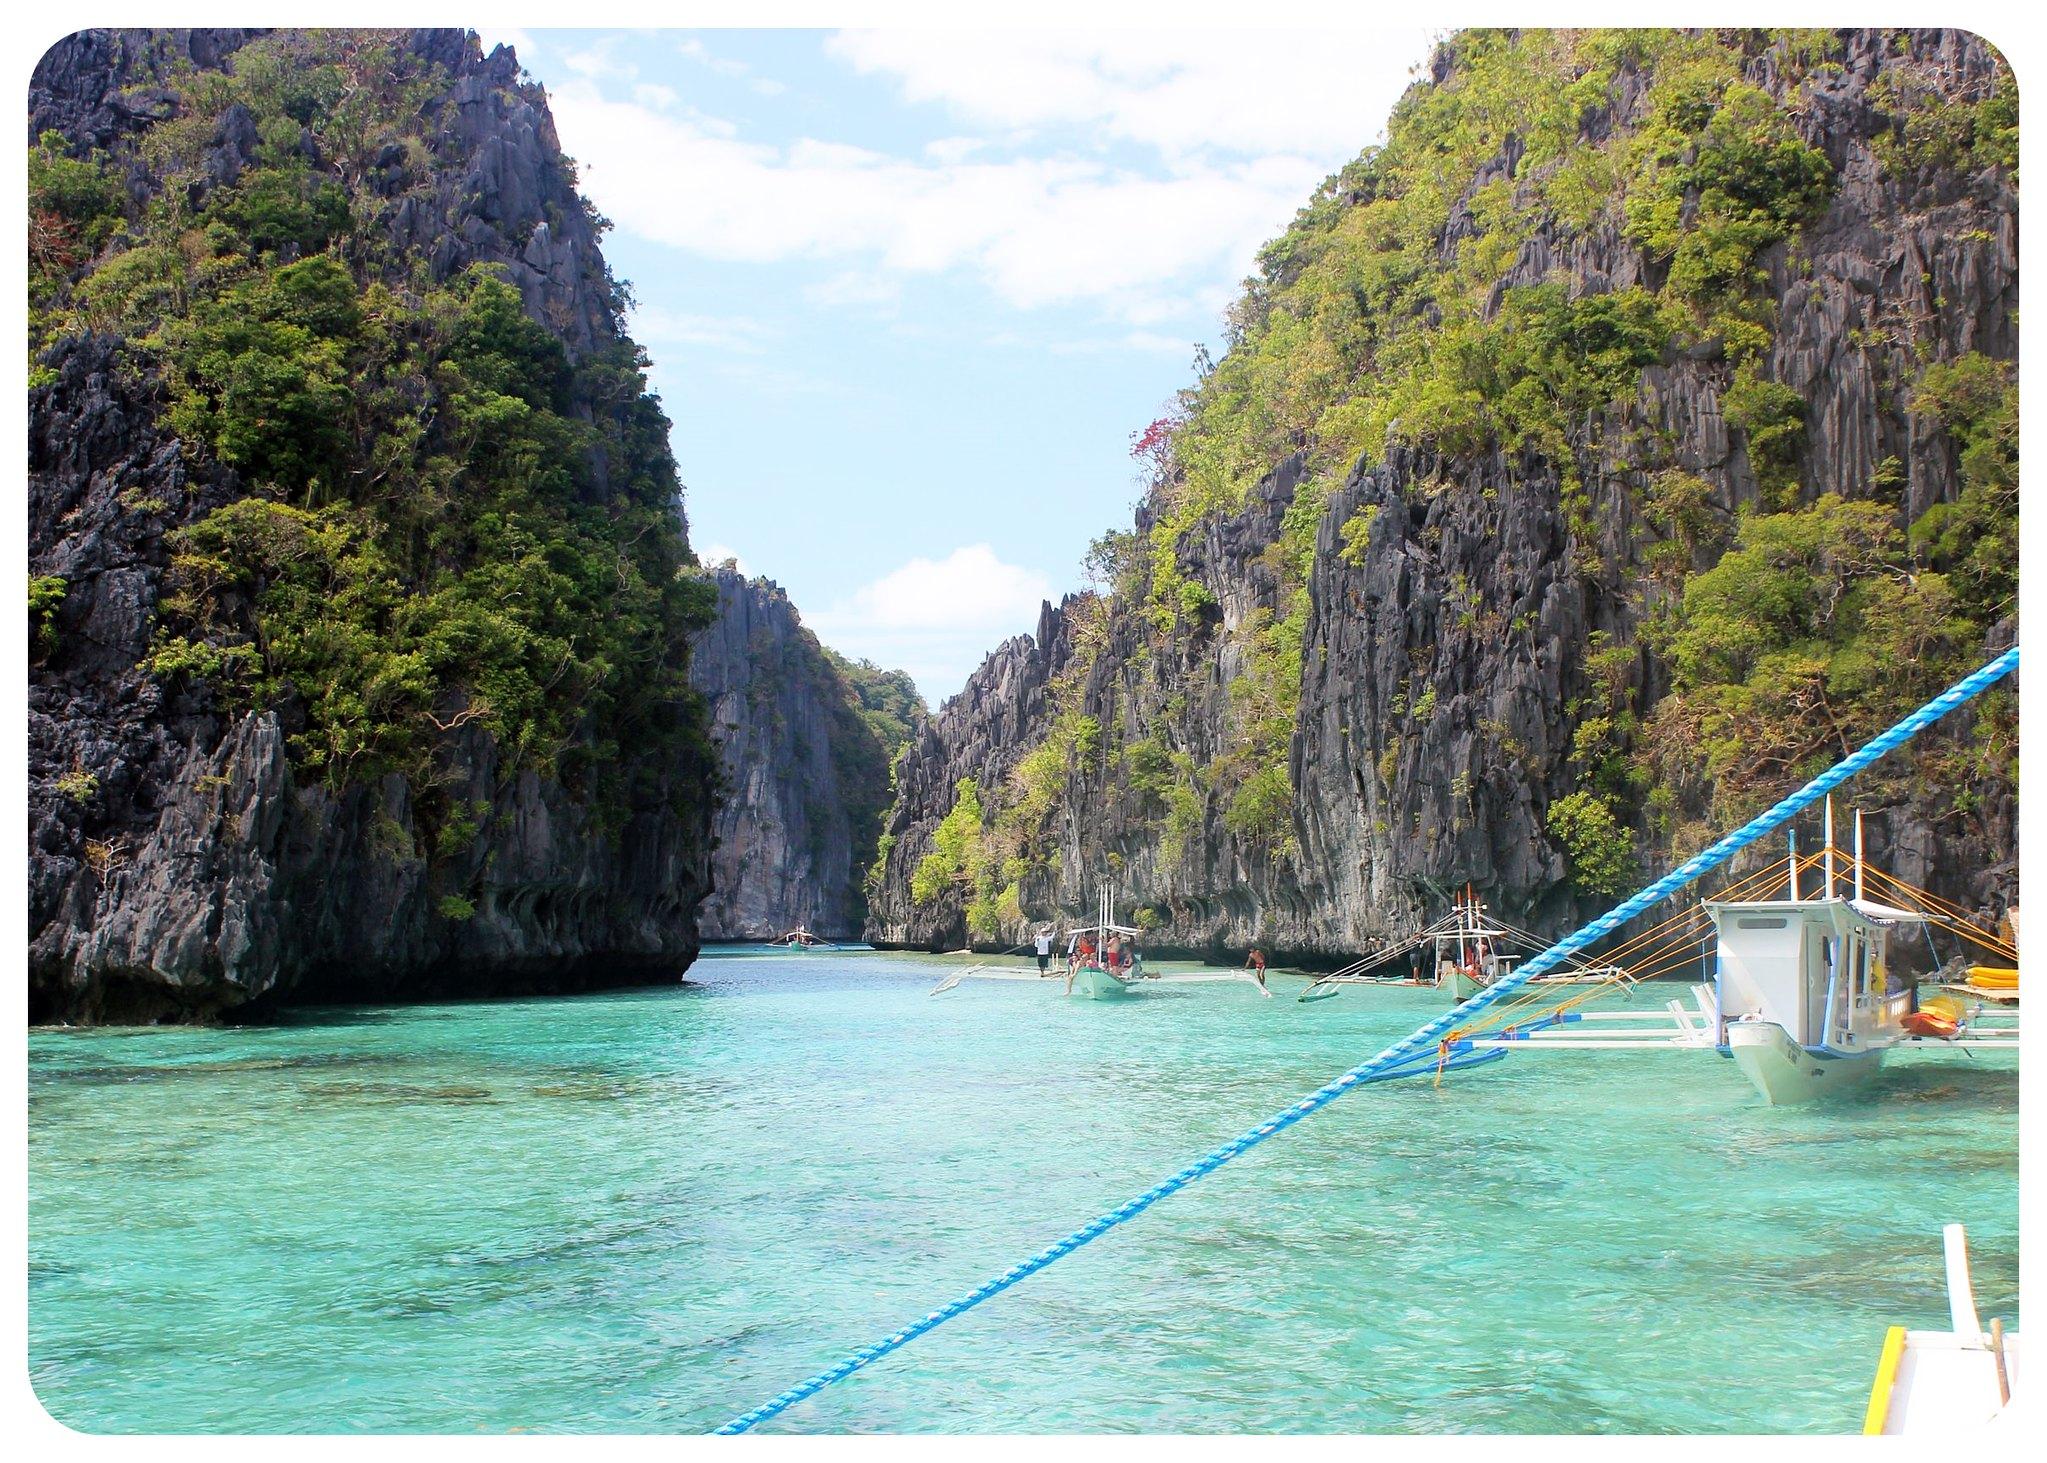 bacuit archipelago lagoon philippines